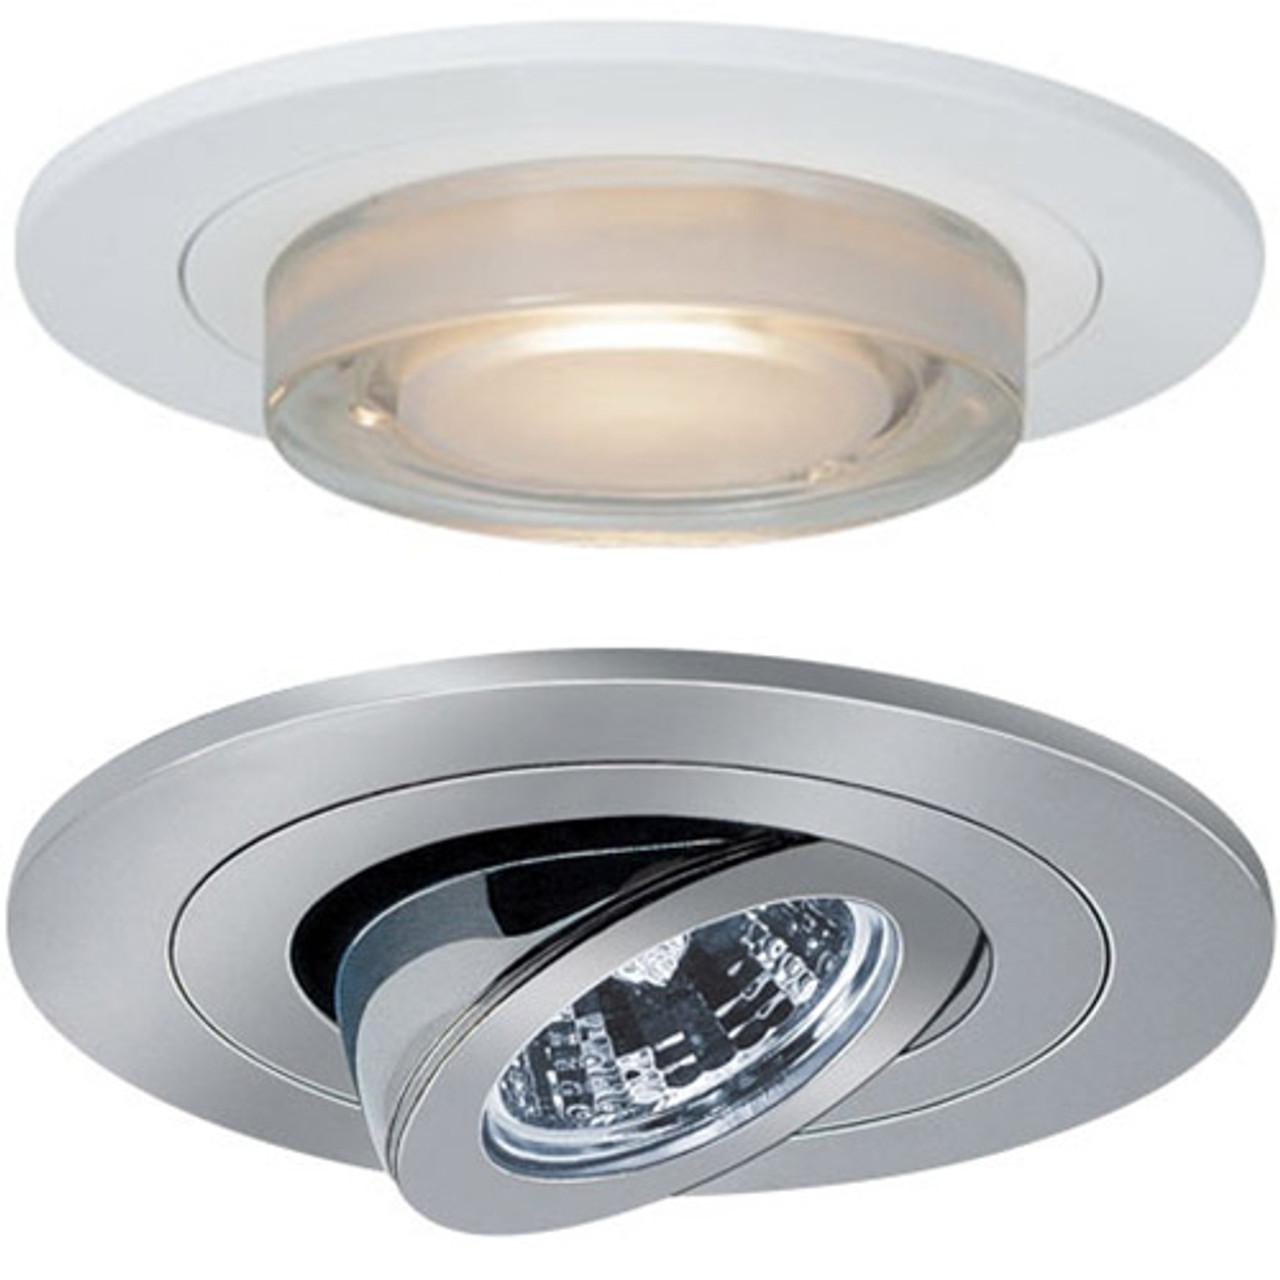 Museum quality recessed lighting : Recessed housings trims